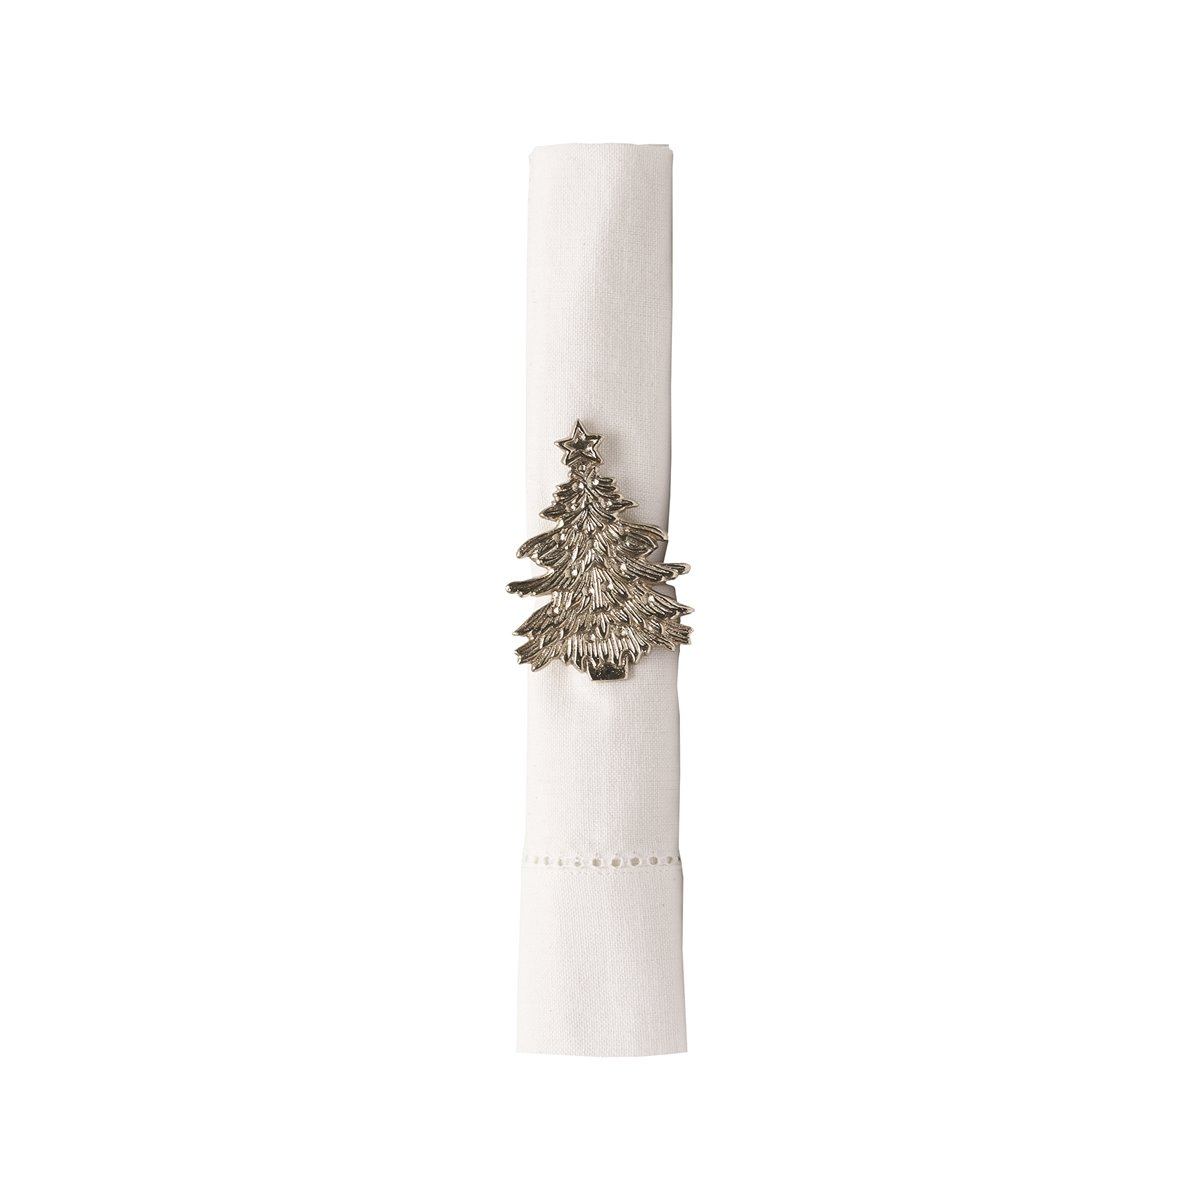 Silver Christmas Tree Napkin Ring